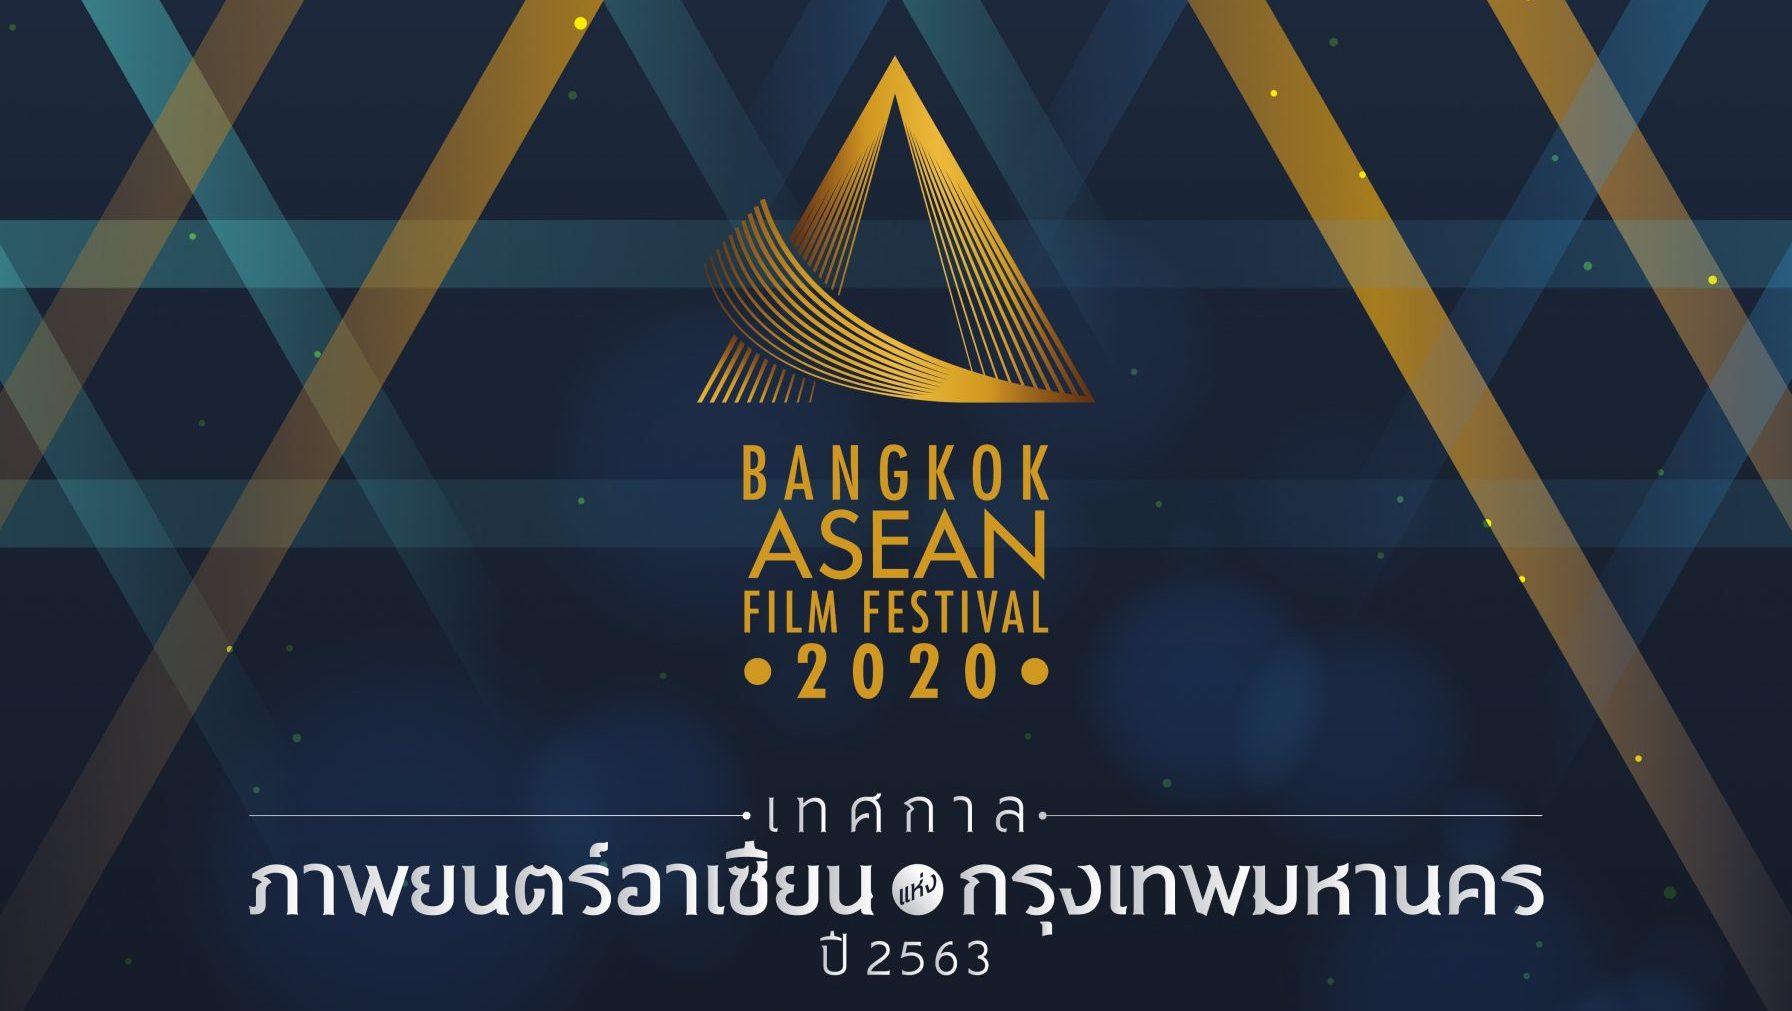 Bangkok Asian Film Festival 2020 กระทรวงวัฒนธรรม